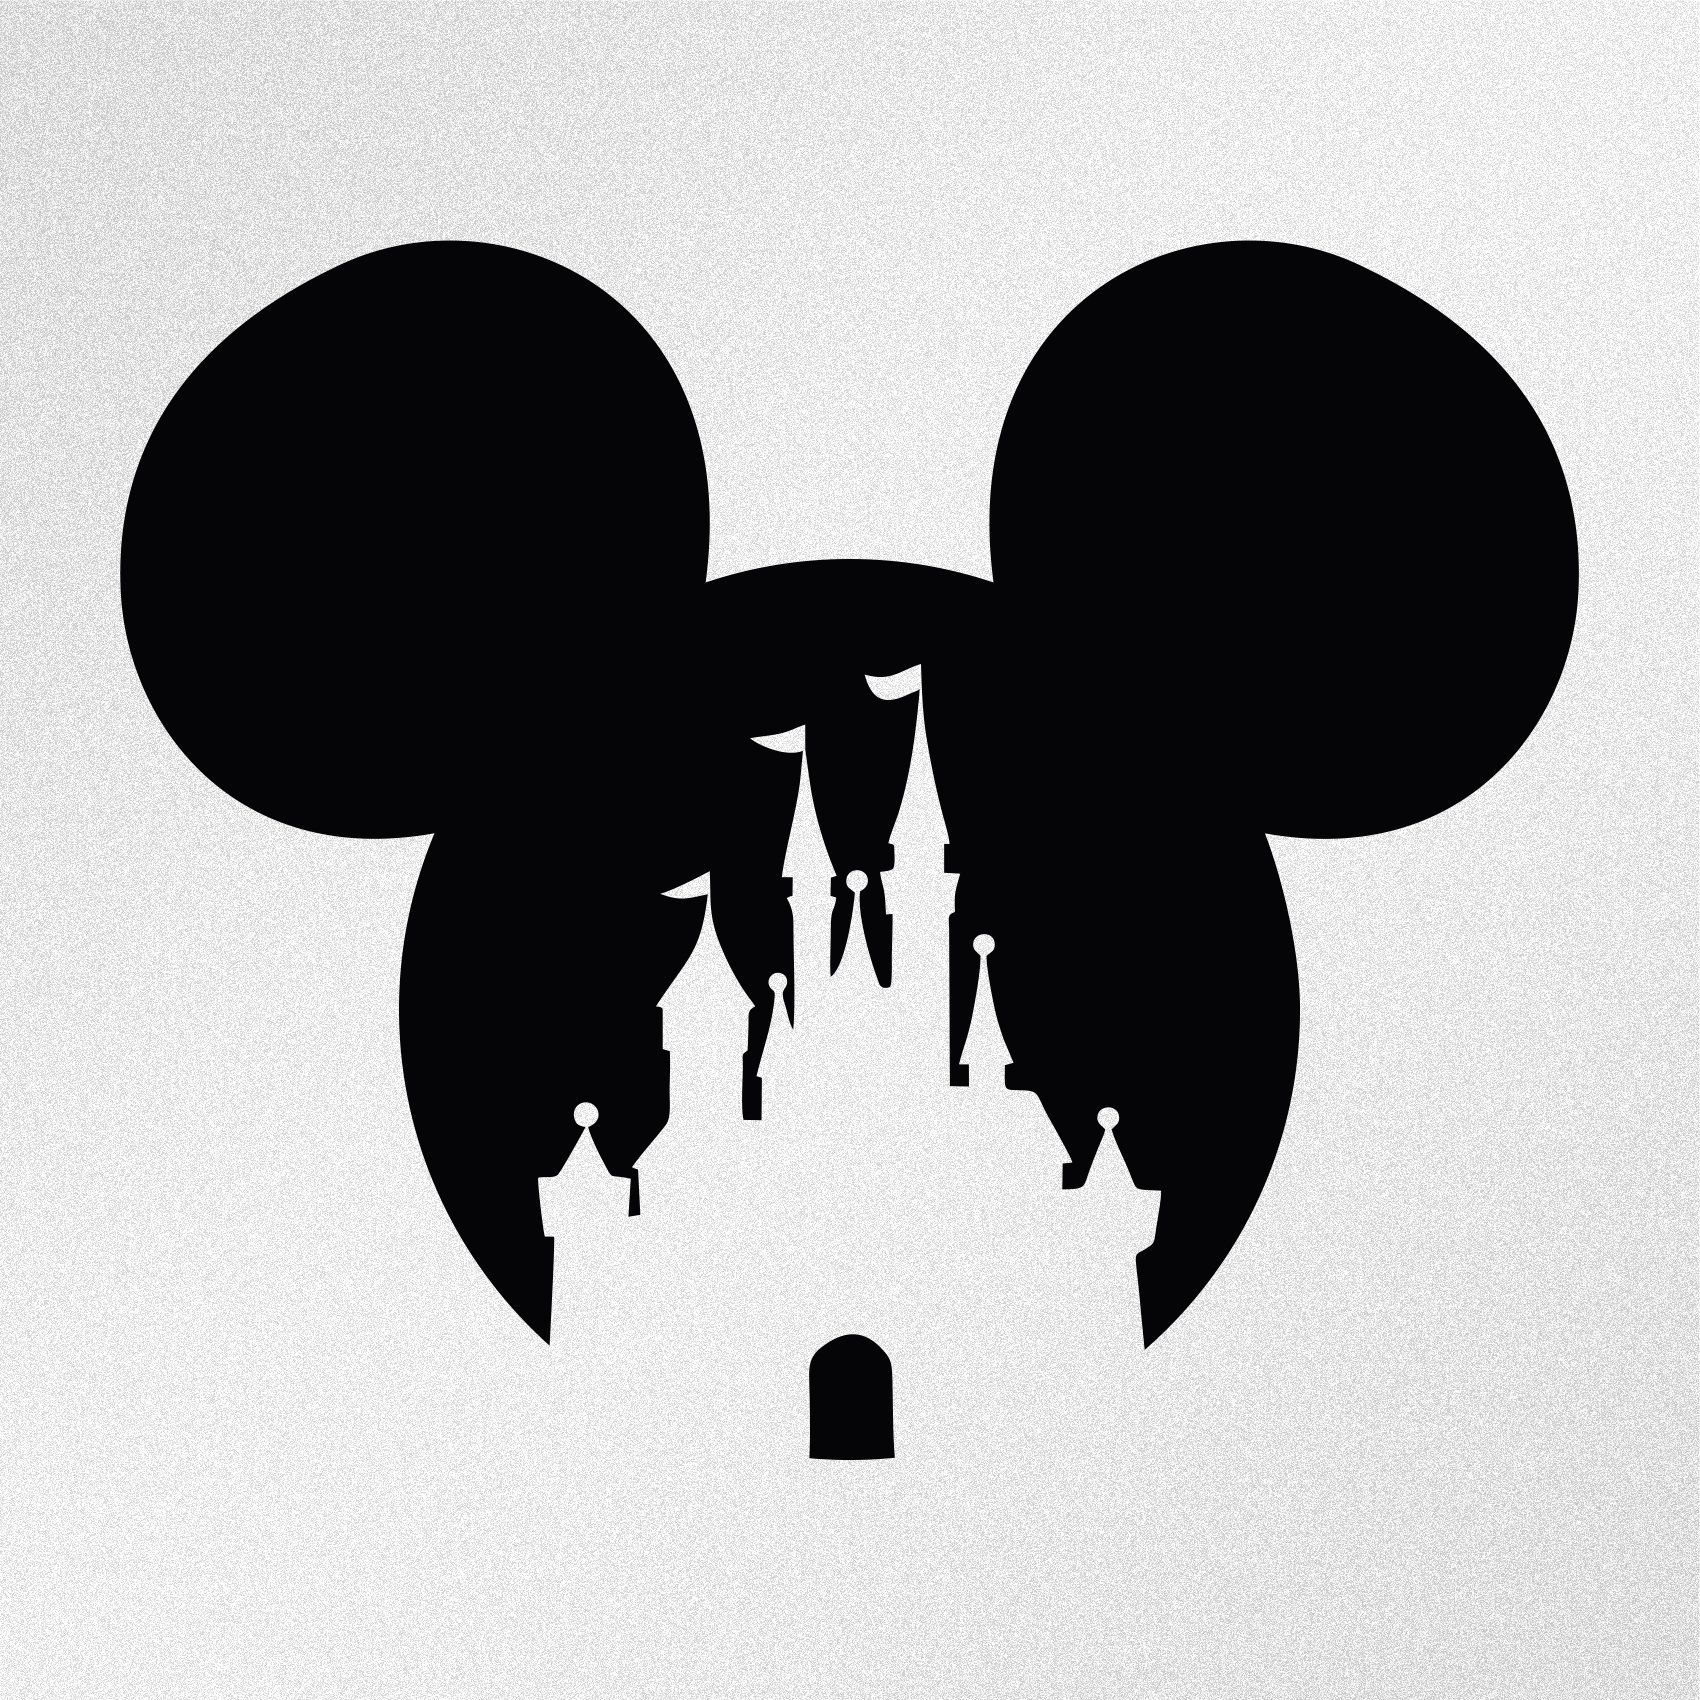 Mickey Mouse Disney Castle Vinyl Decal Sticker Disney Stencils Disney Decals Disney Sticker [ 1700 x 1700 Pixel ]